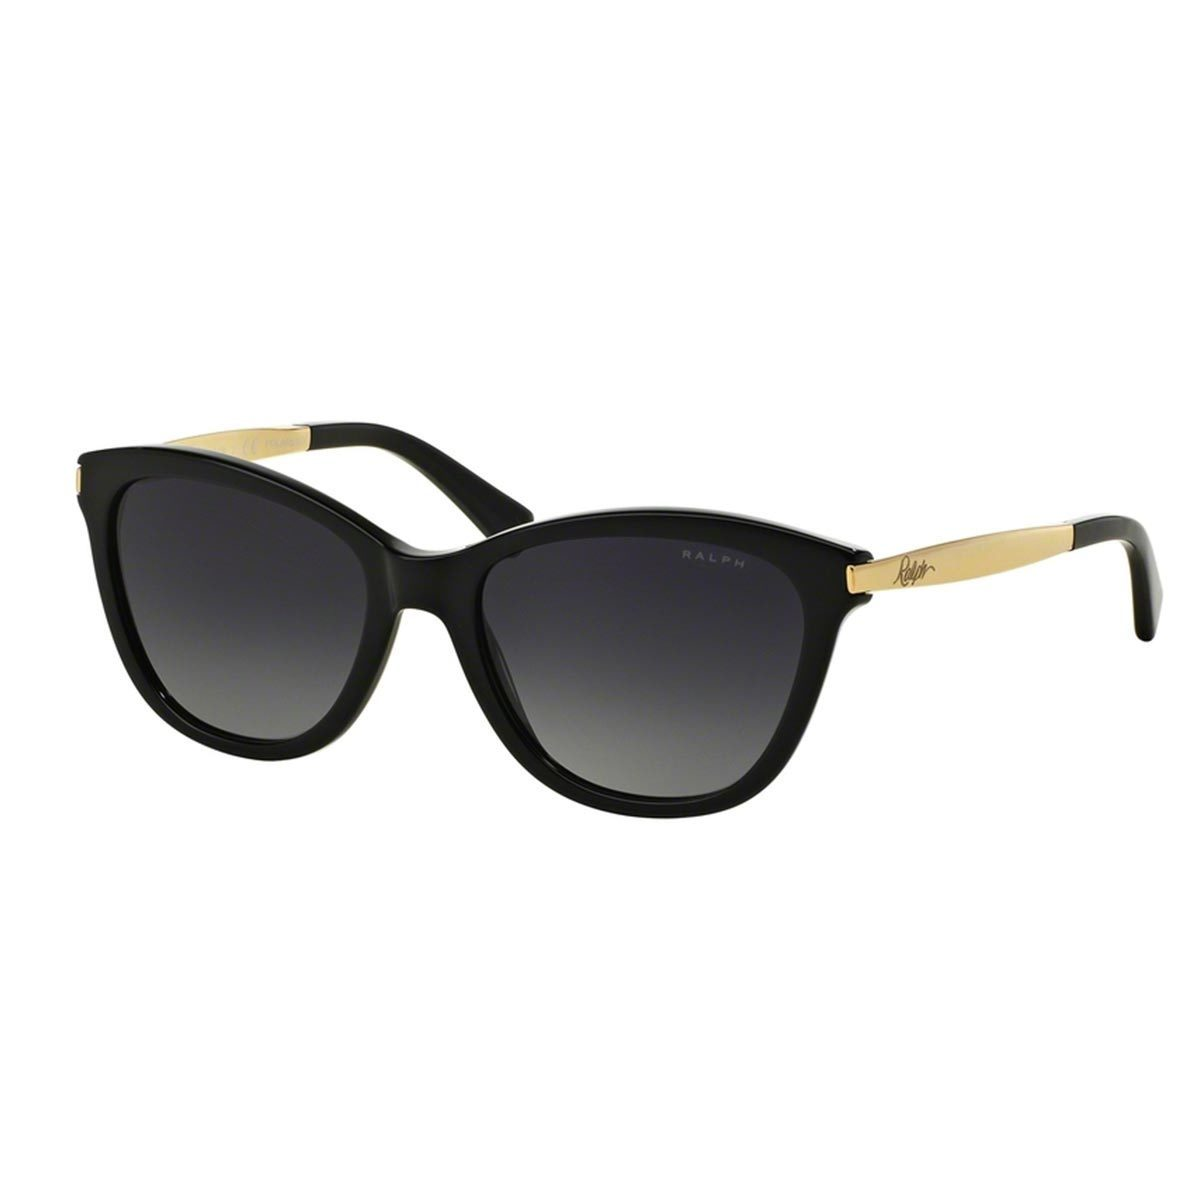 8510574419a Ralph by Ralph Lauren Women s RA5201 Black Plastic Cat Eye Polarized  Sunglasses